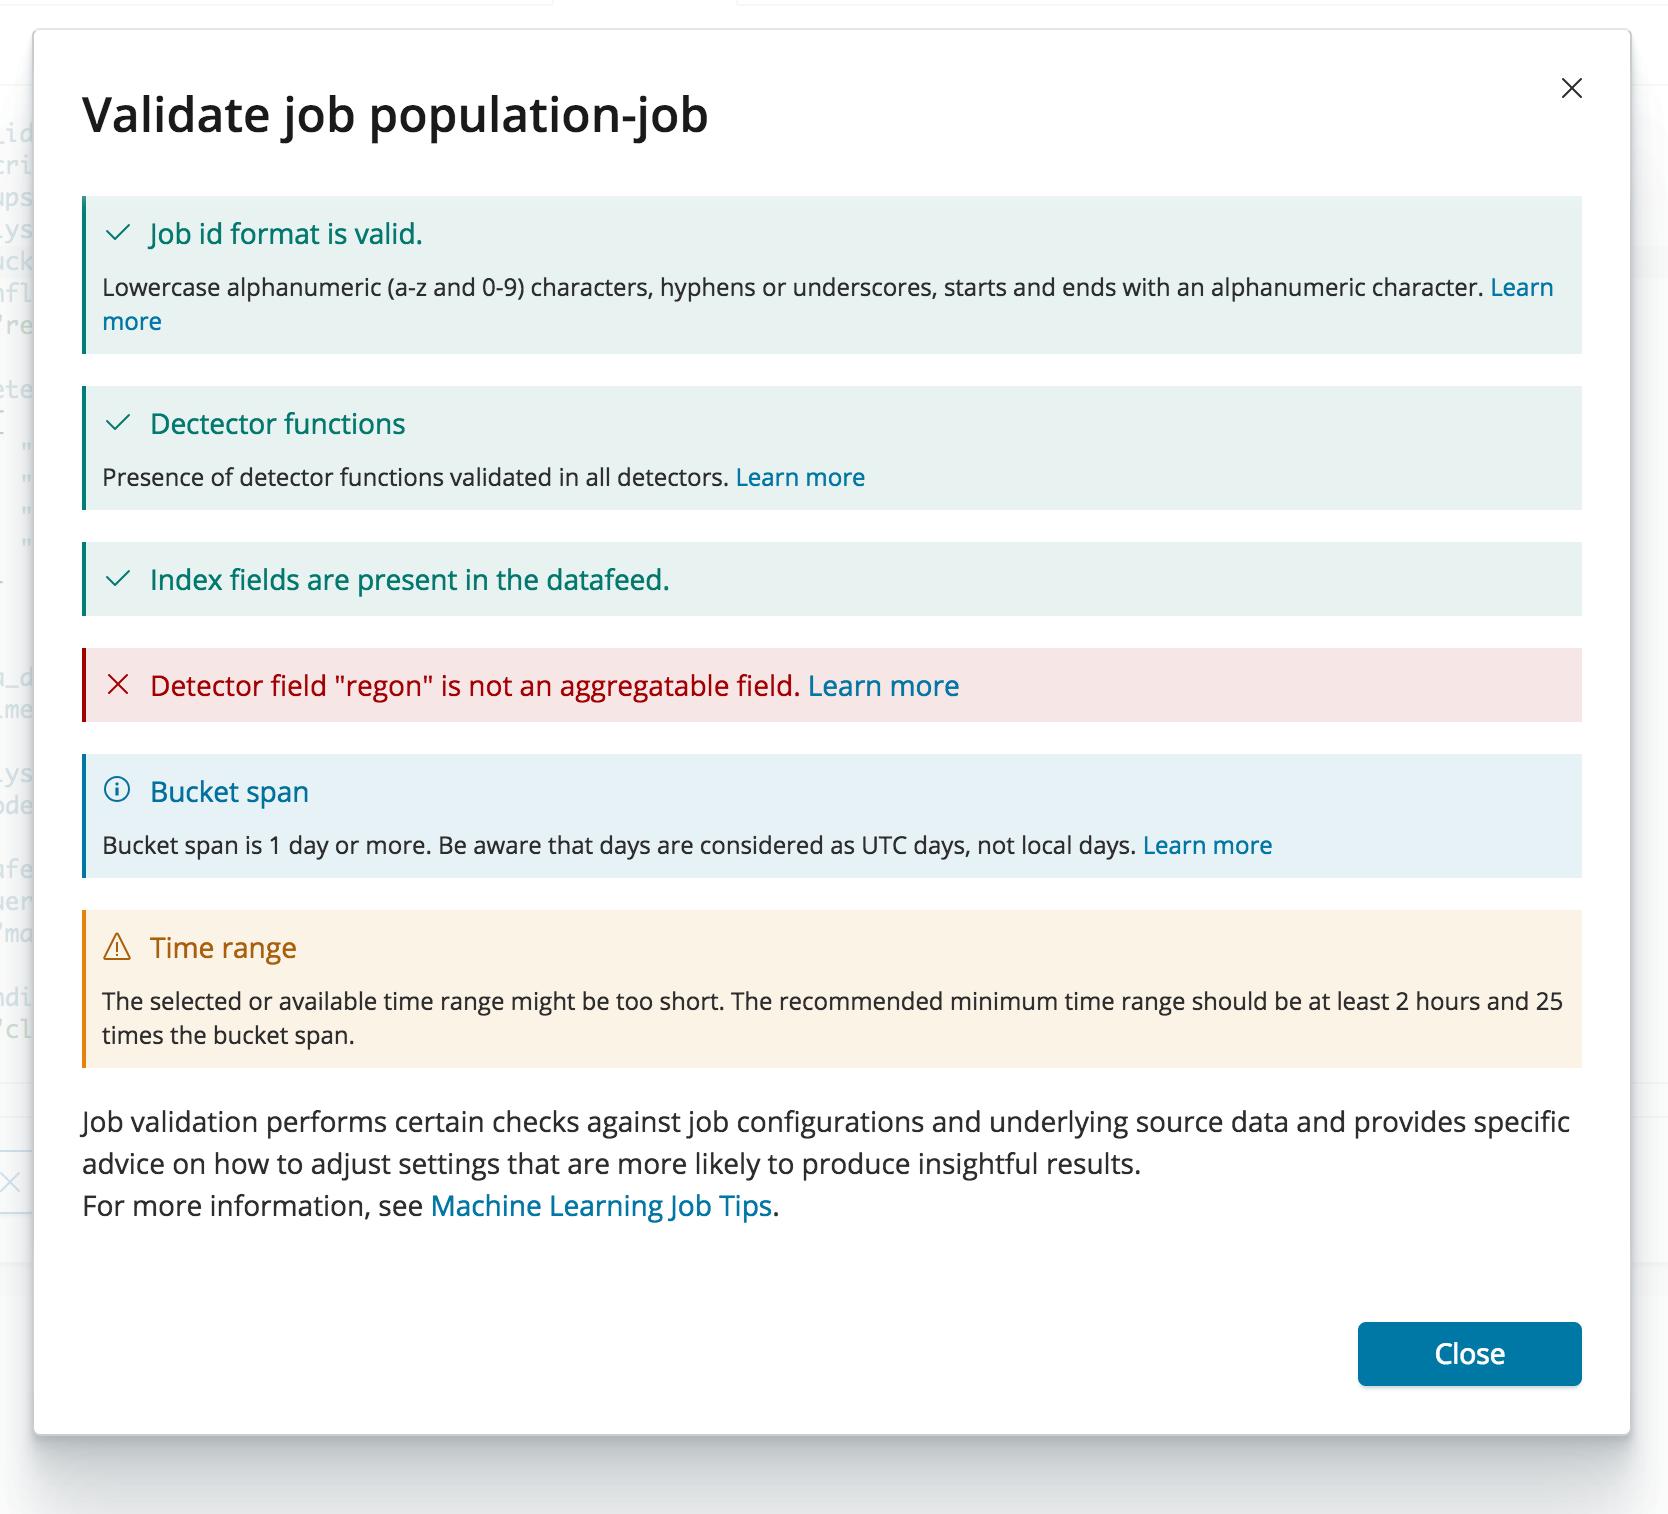 Job Validation